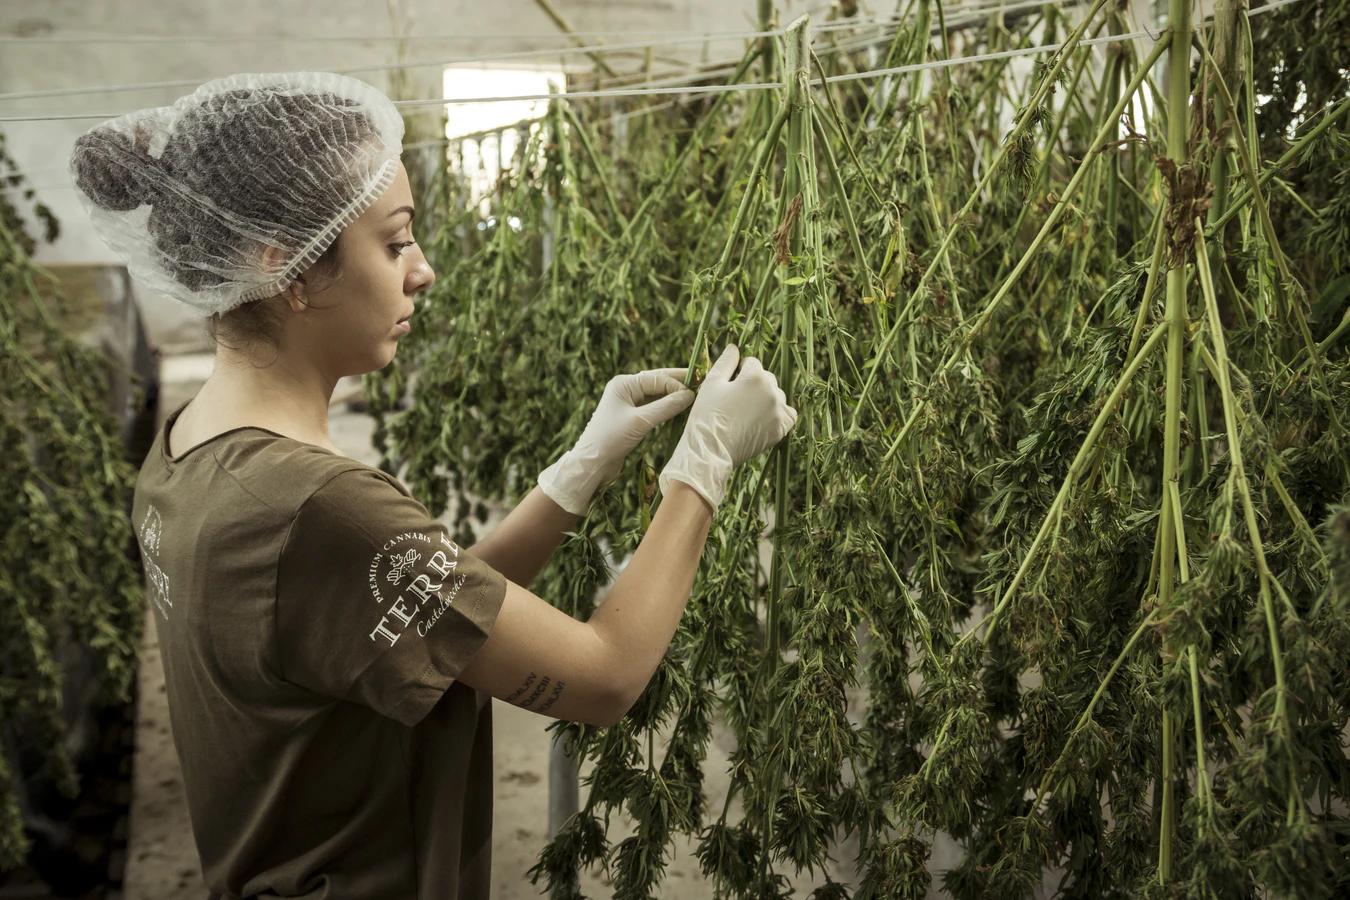 cannabis-grower-hangs-dried-flower